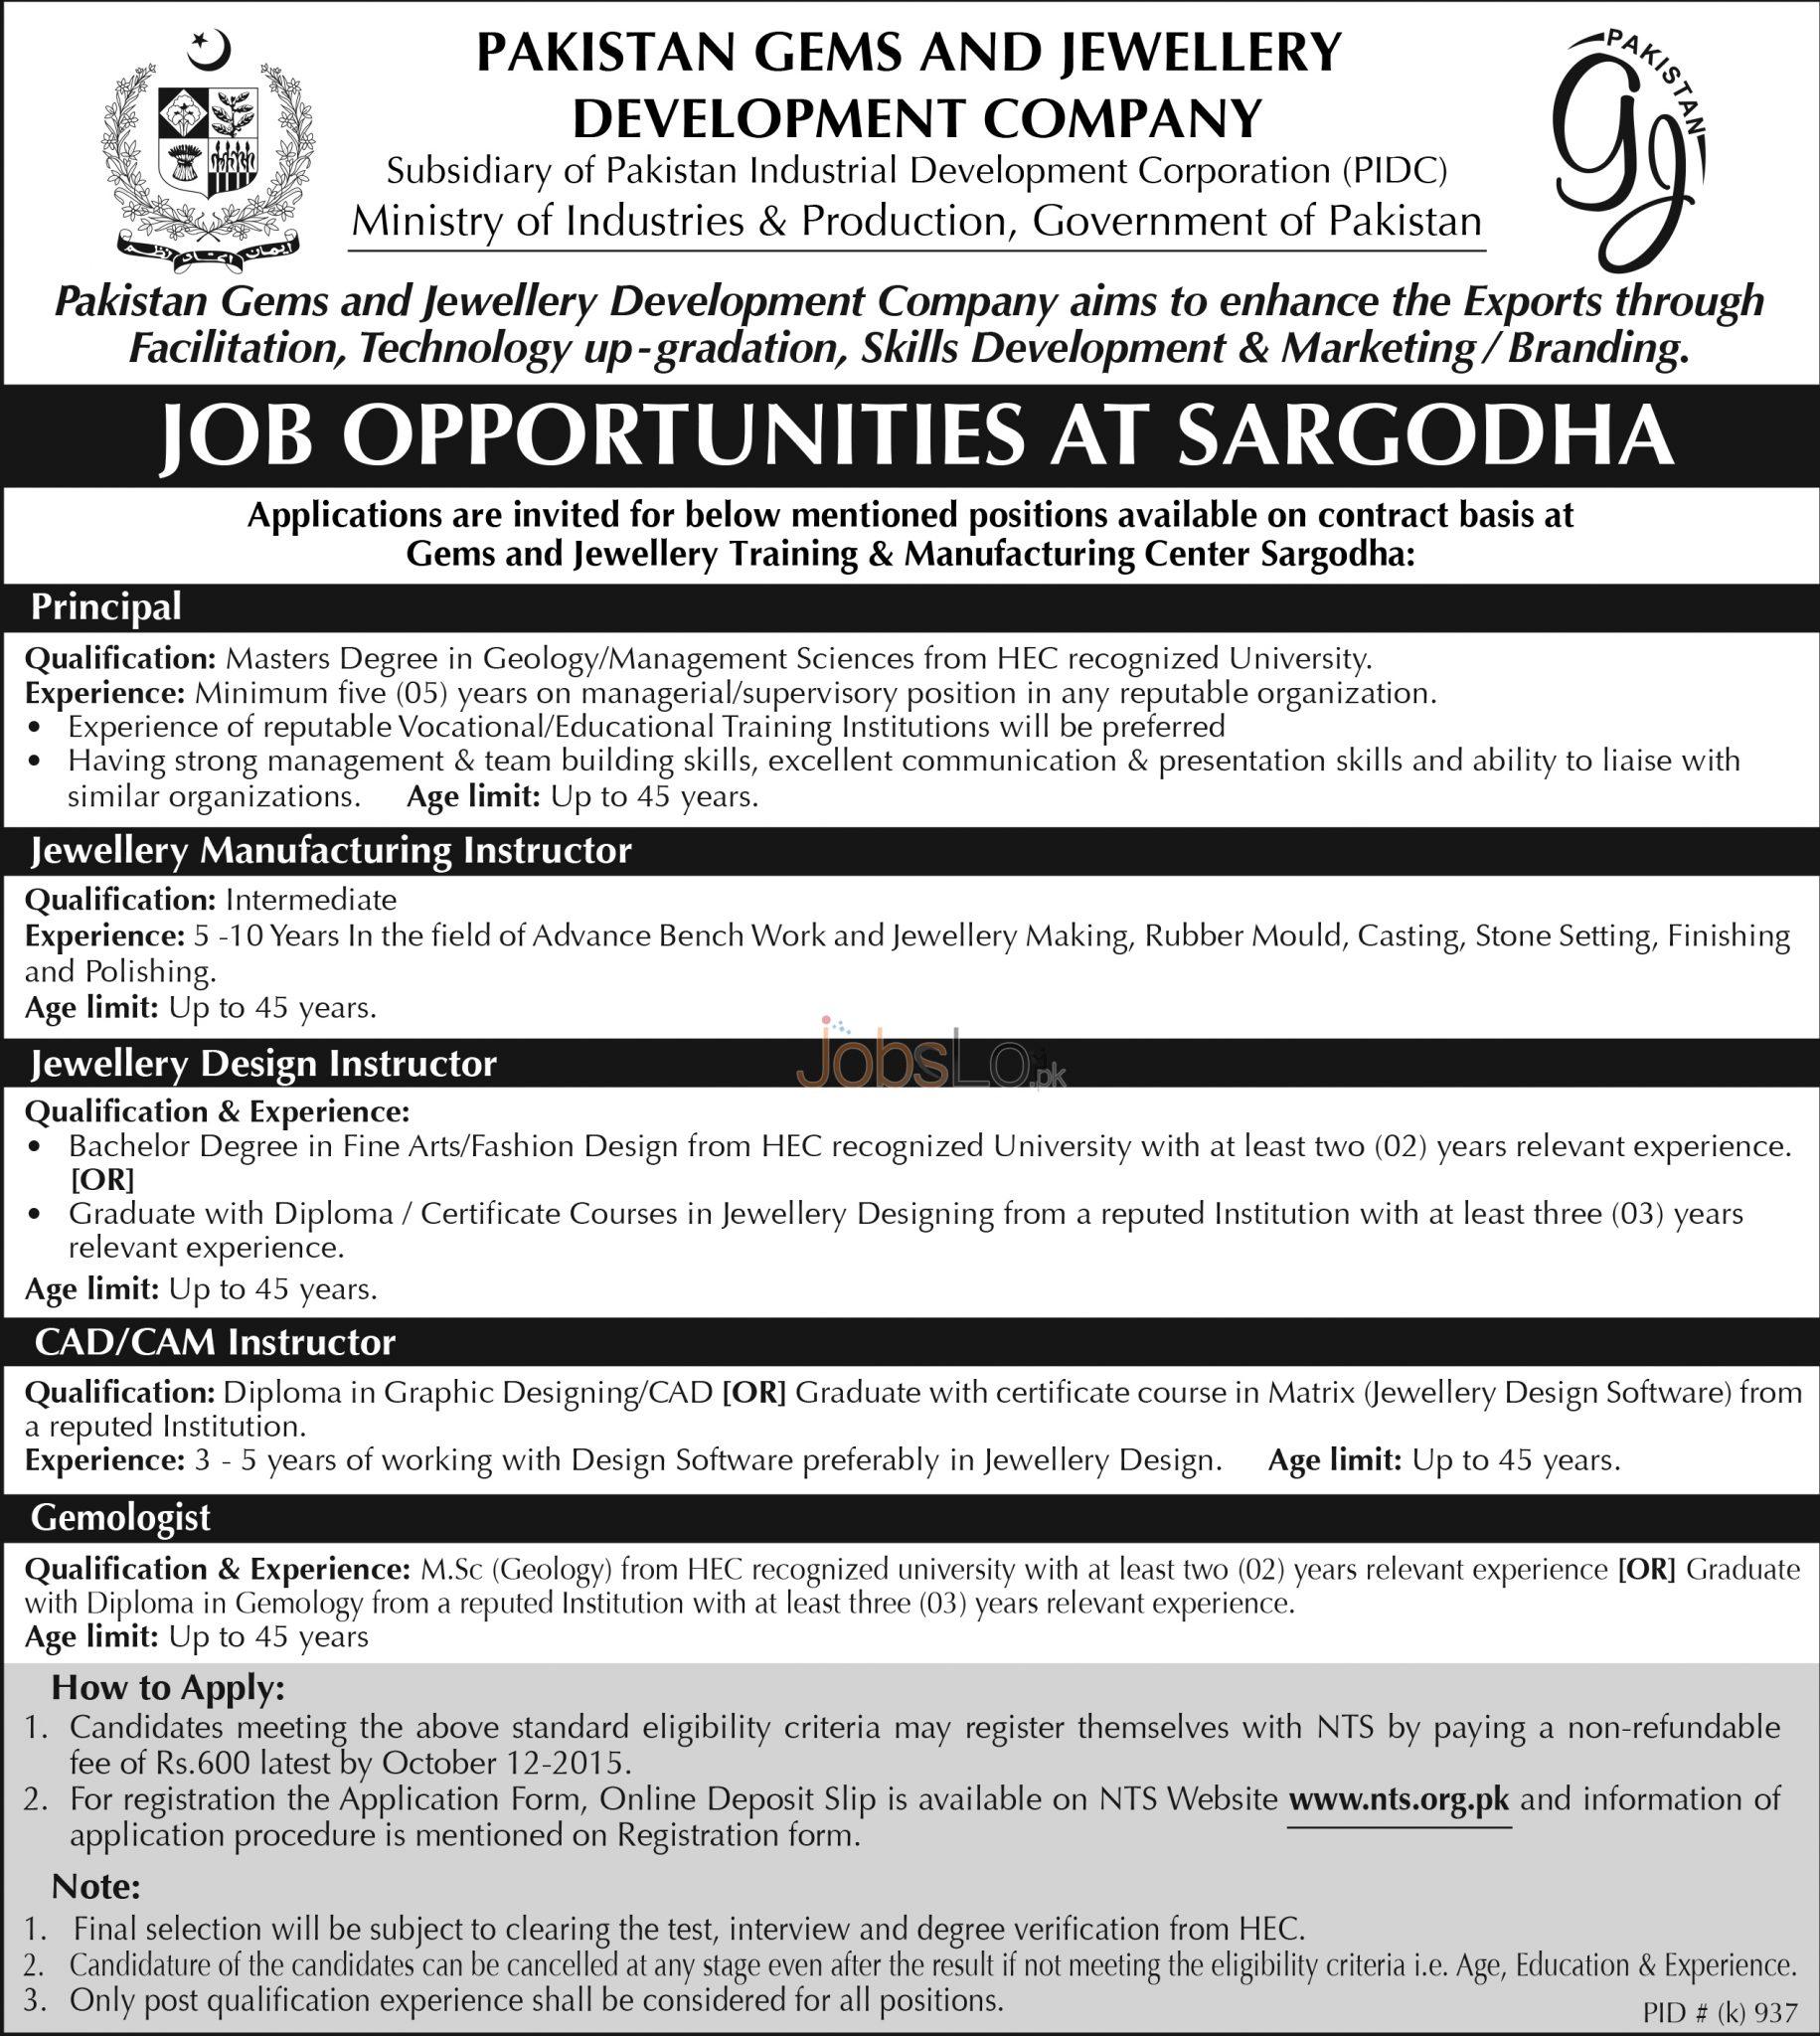 PGJDC Sargodha Jobs